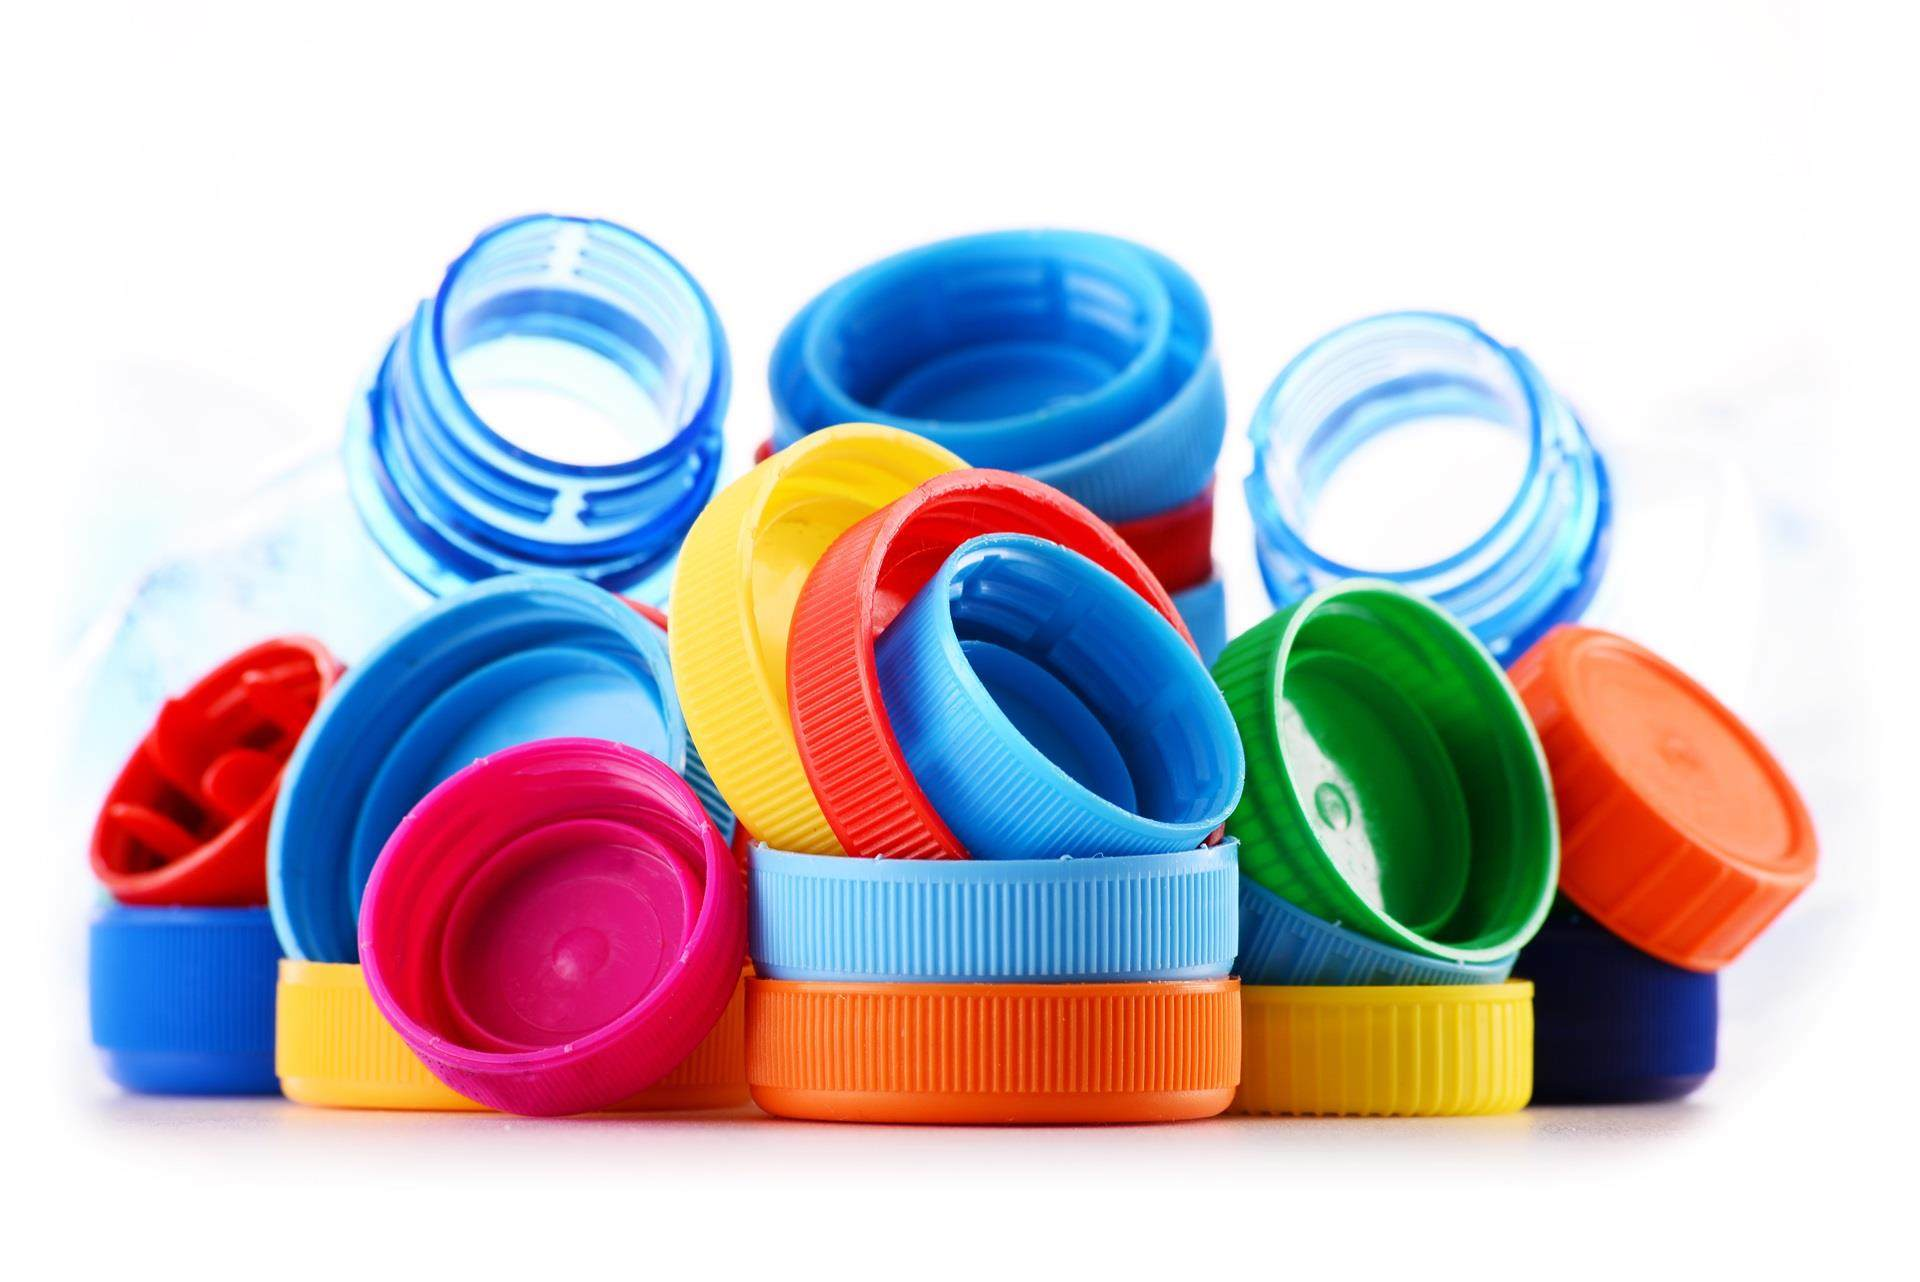 Caps & Closures  Ancillary Packaging